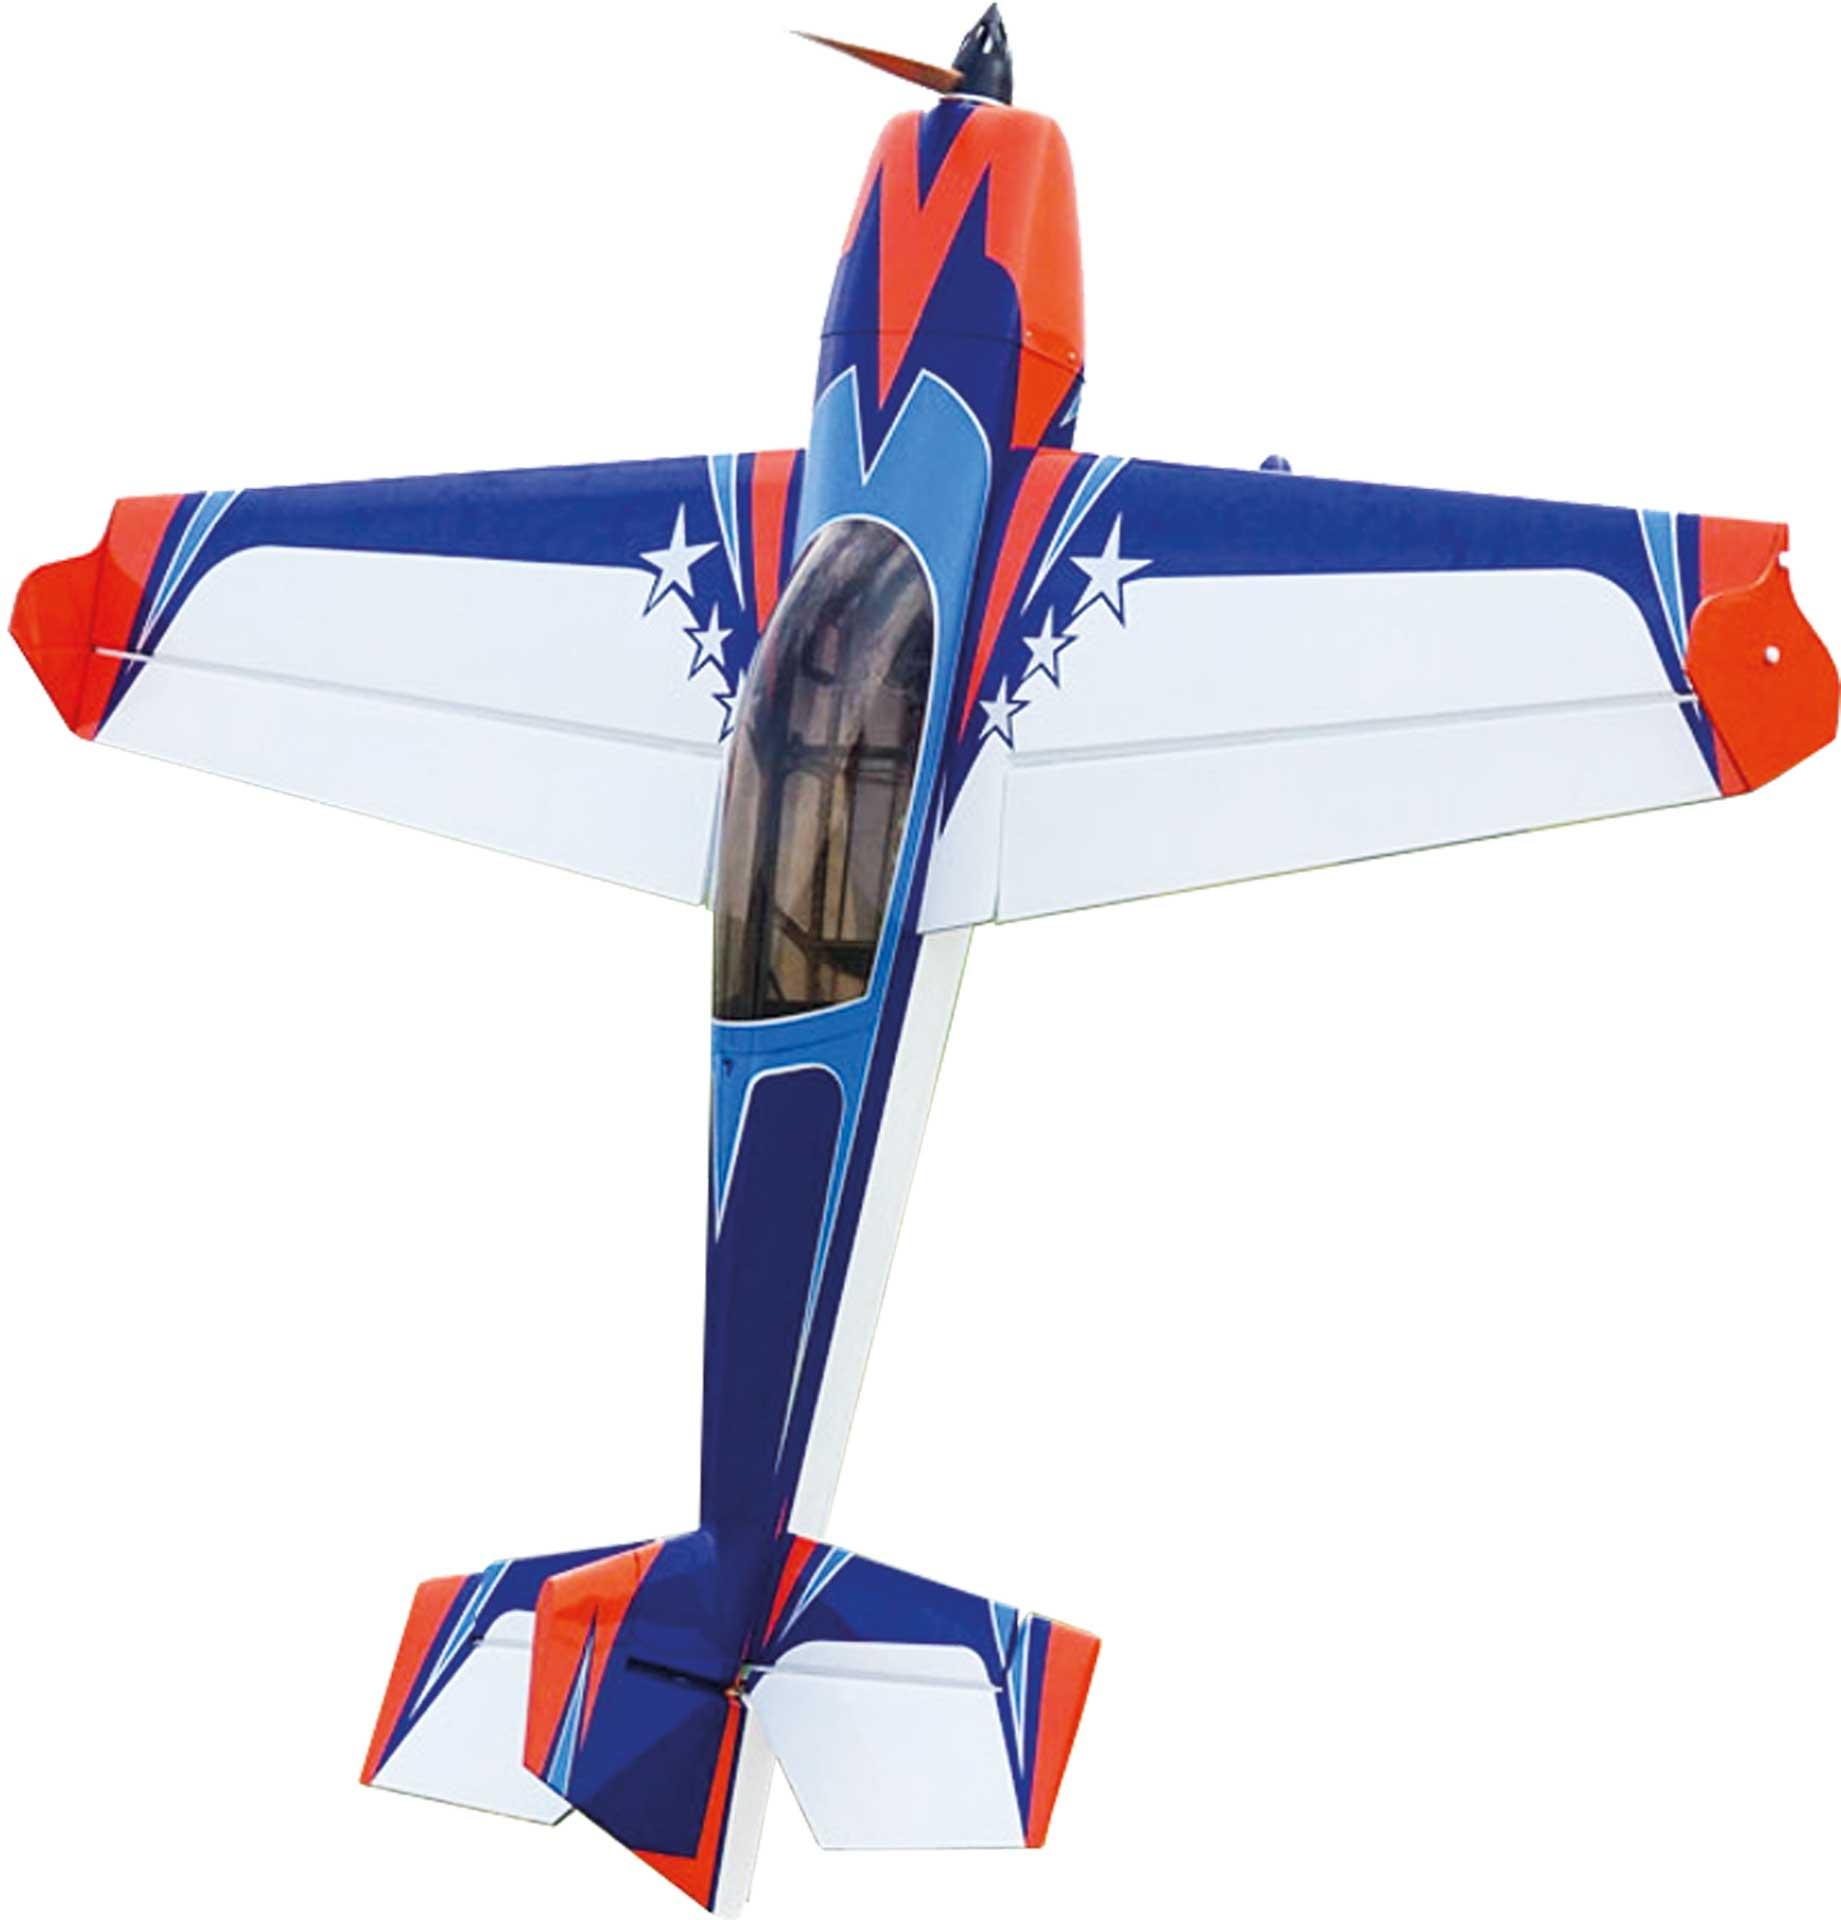 "EXTREMEFLIGHT-RC EXTRA 300 60"" EXP V2 Plus EXP orange/ blau ARF"